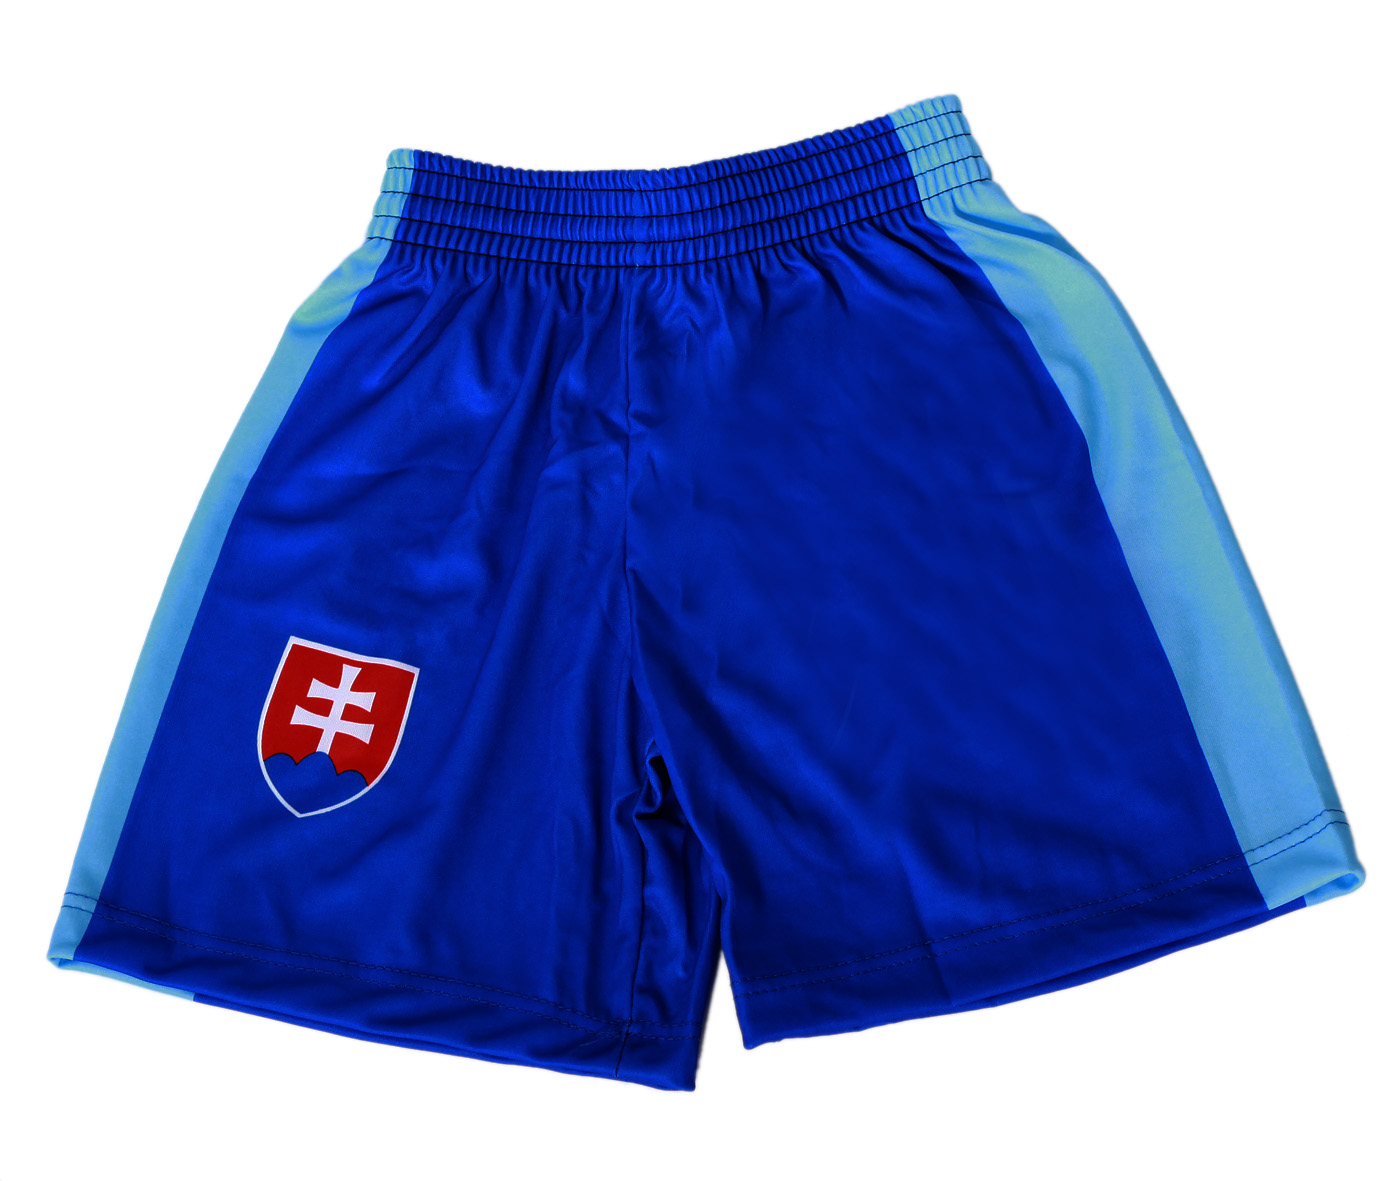 233f7c211dab5 DRESY - SLOVAKIA SLOVENSKO | detské reprezent. futbal. trenírky ...